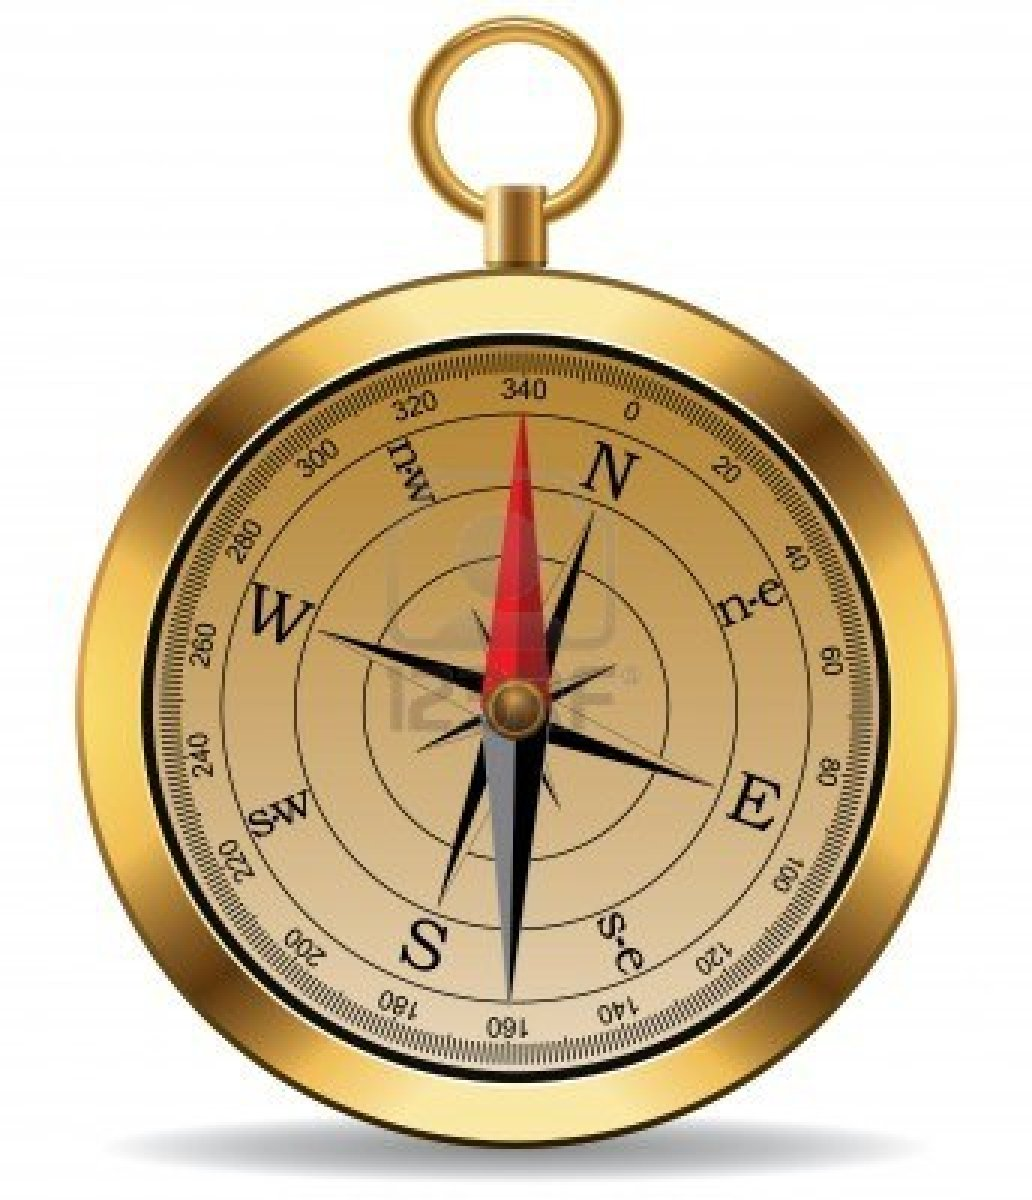 Compass sense